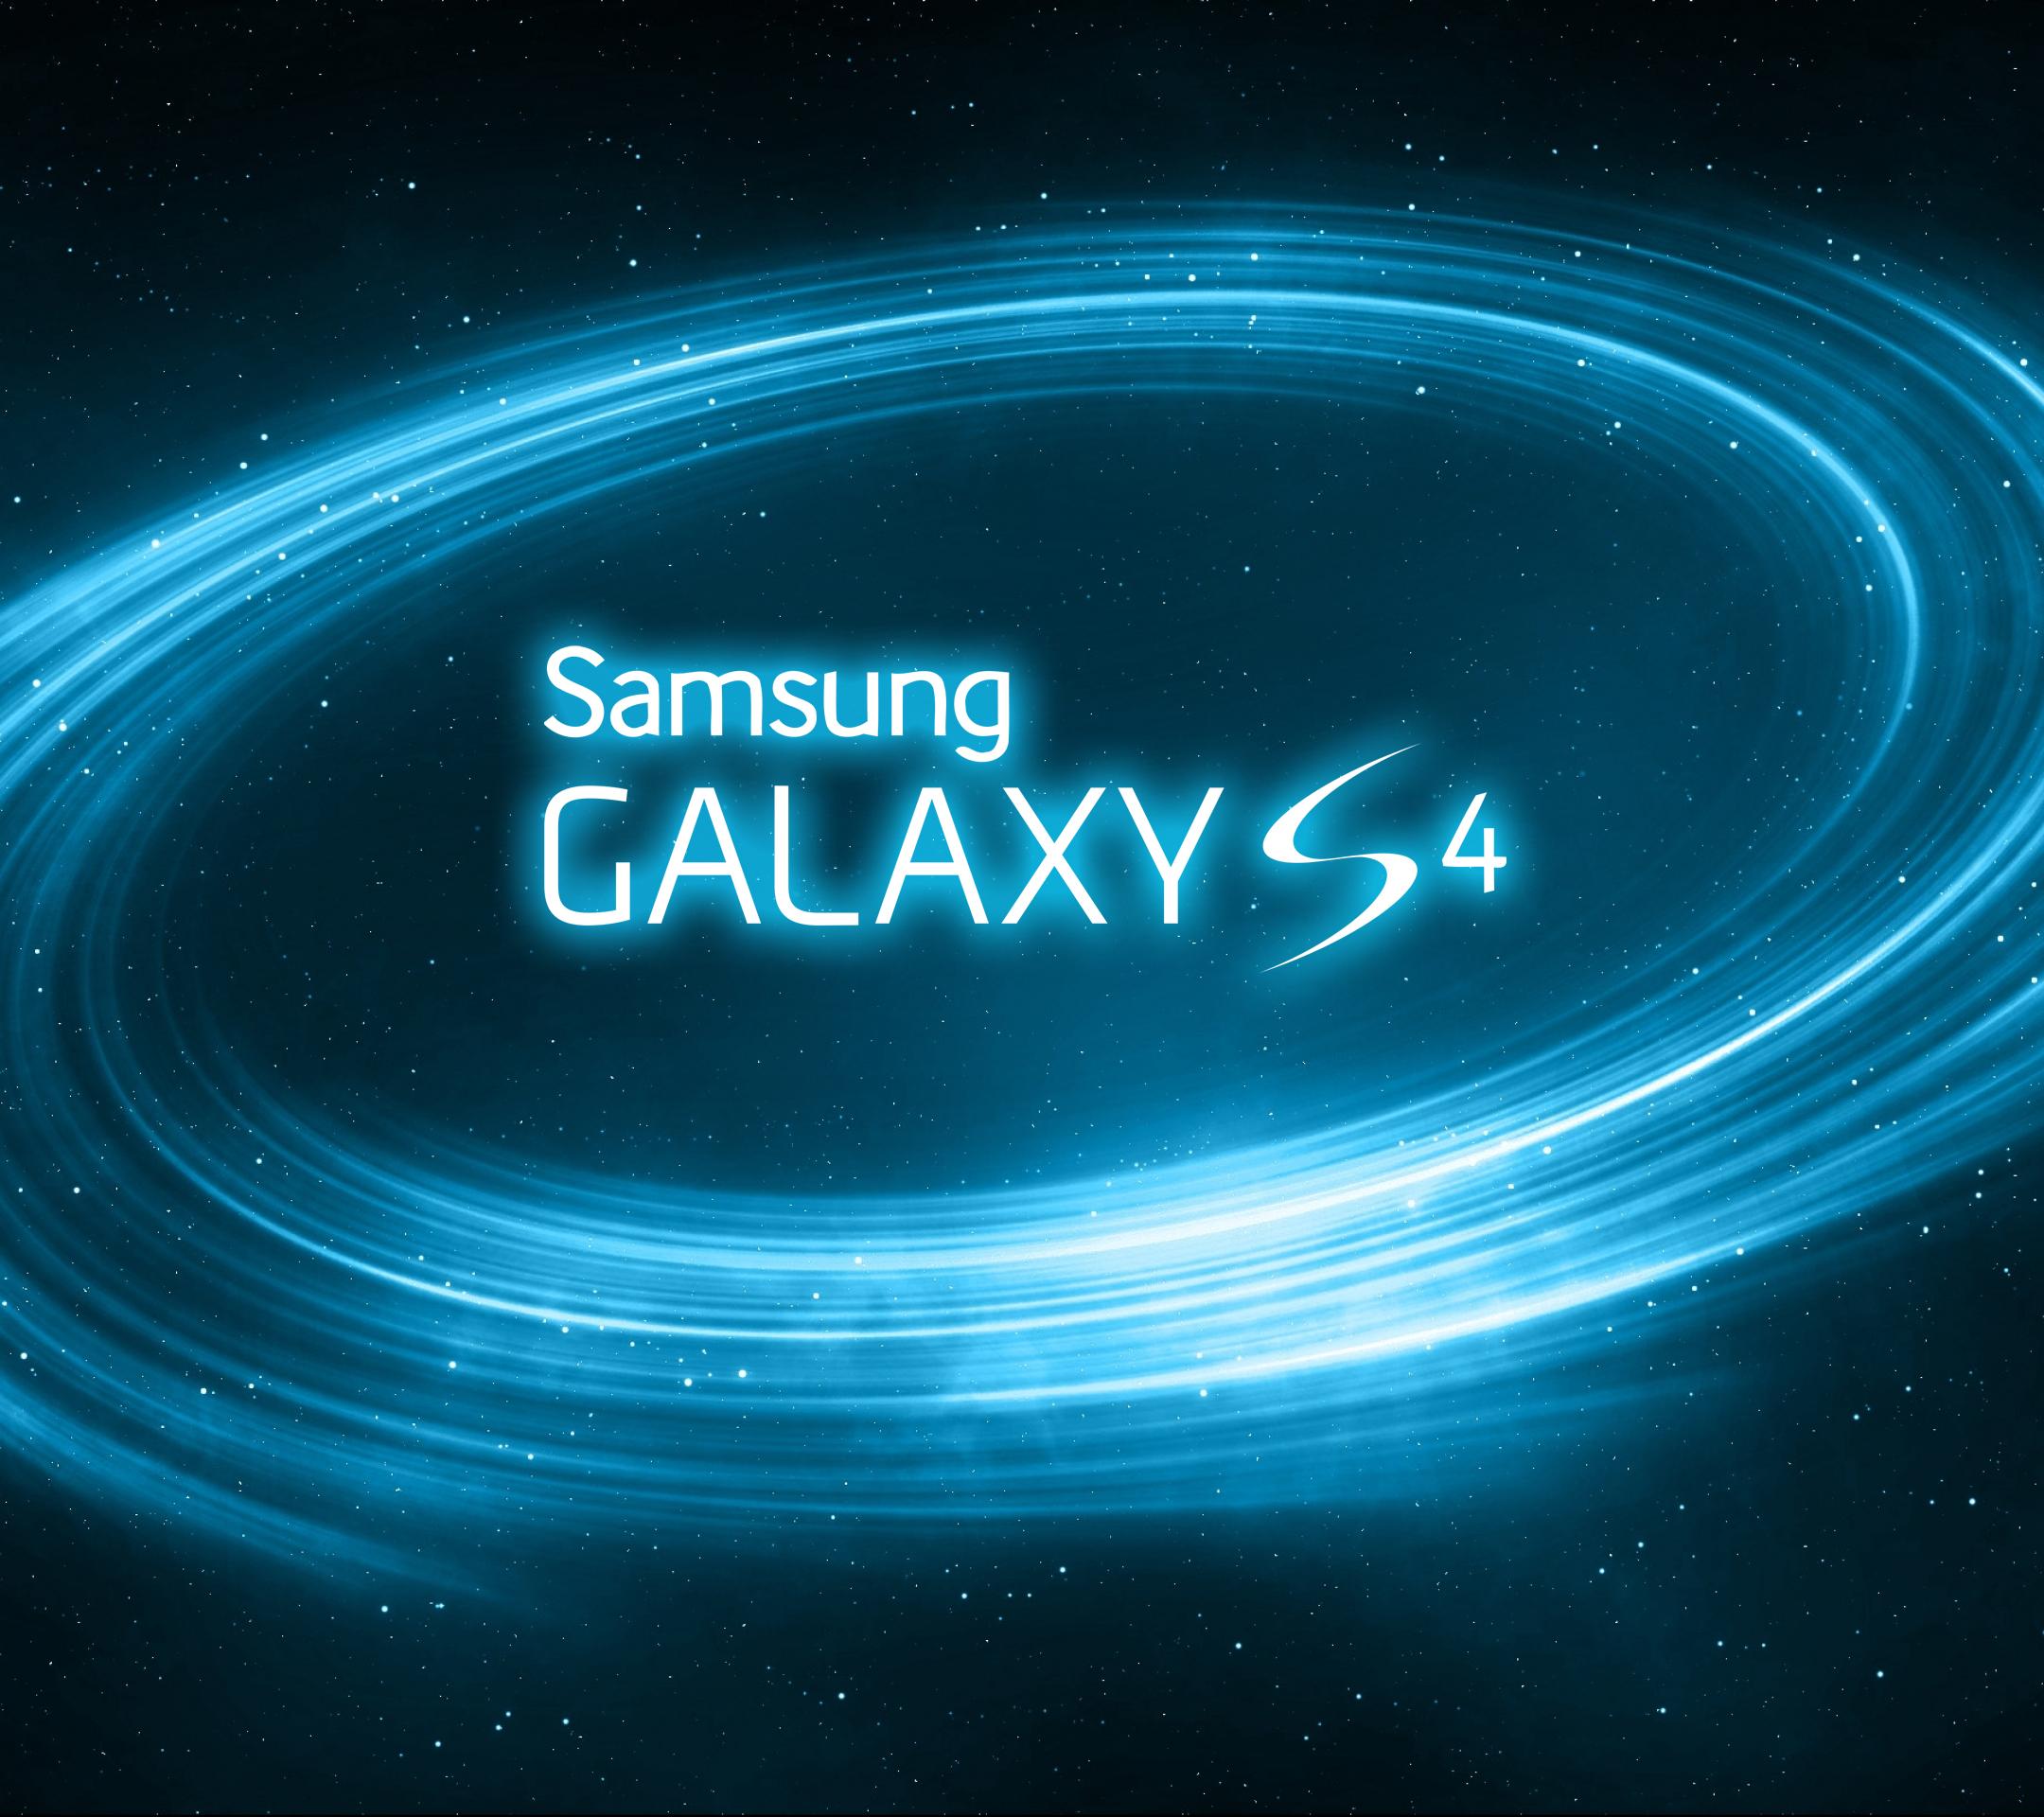 Samsung Galaxy S4 Live Wallpaper Life Companion